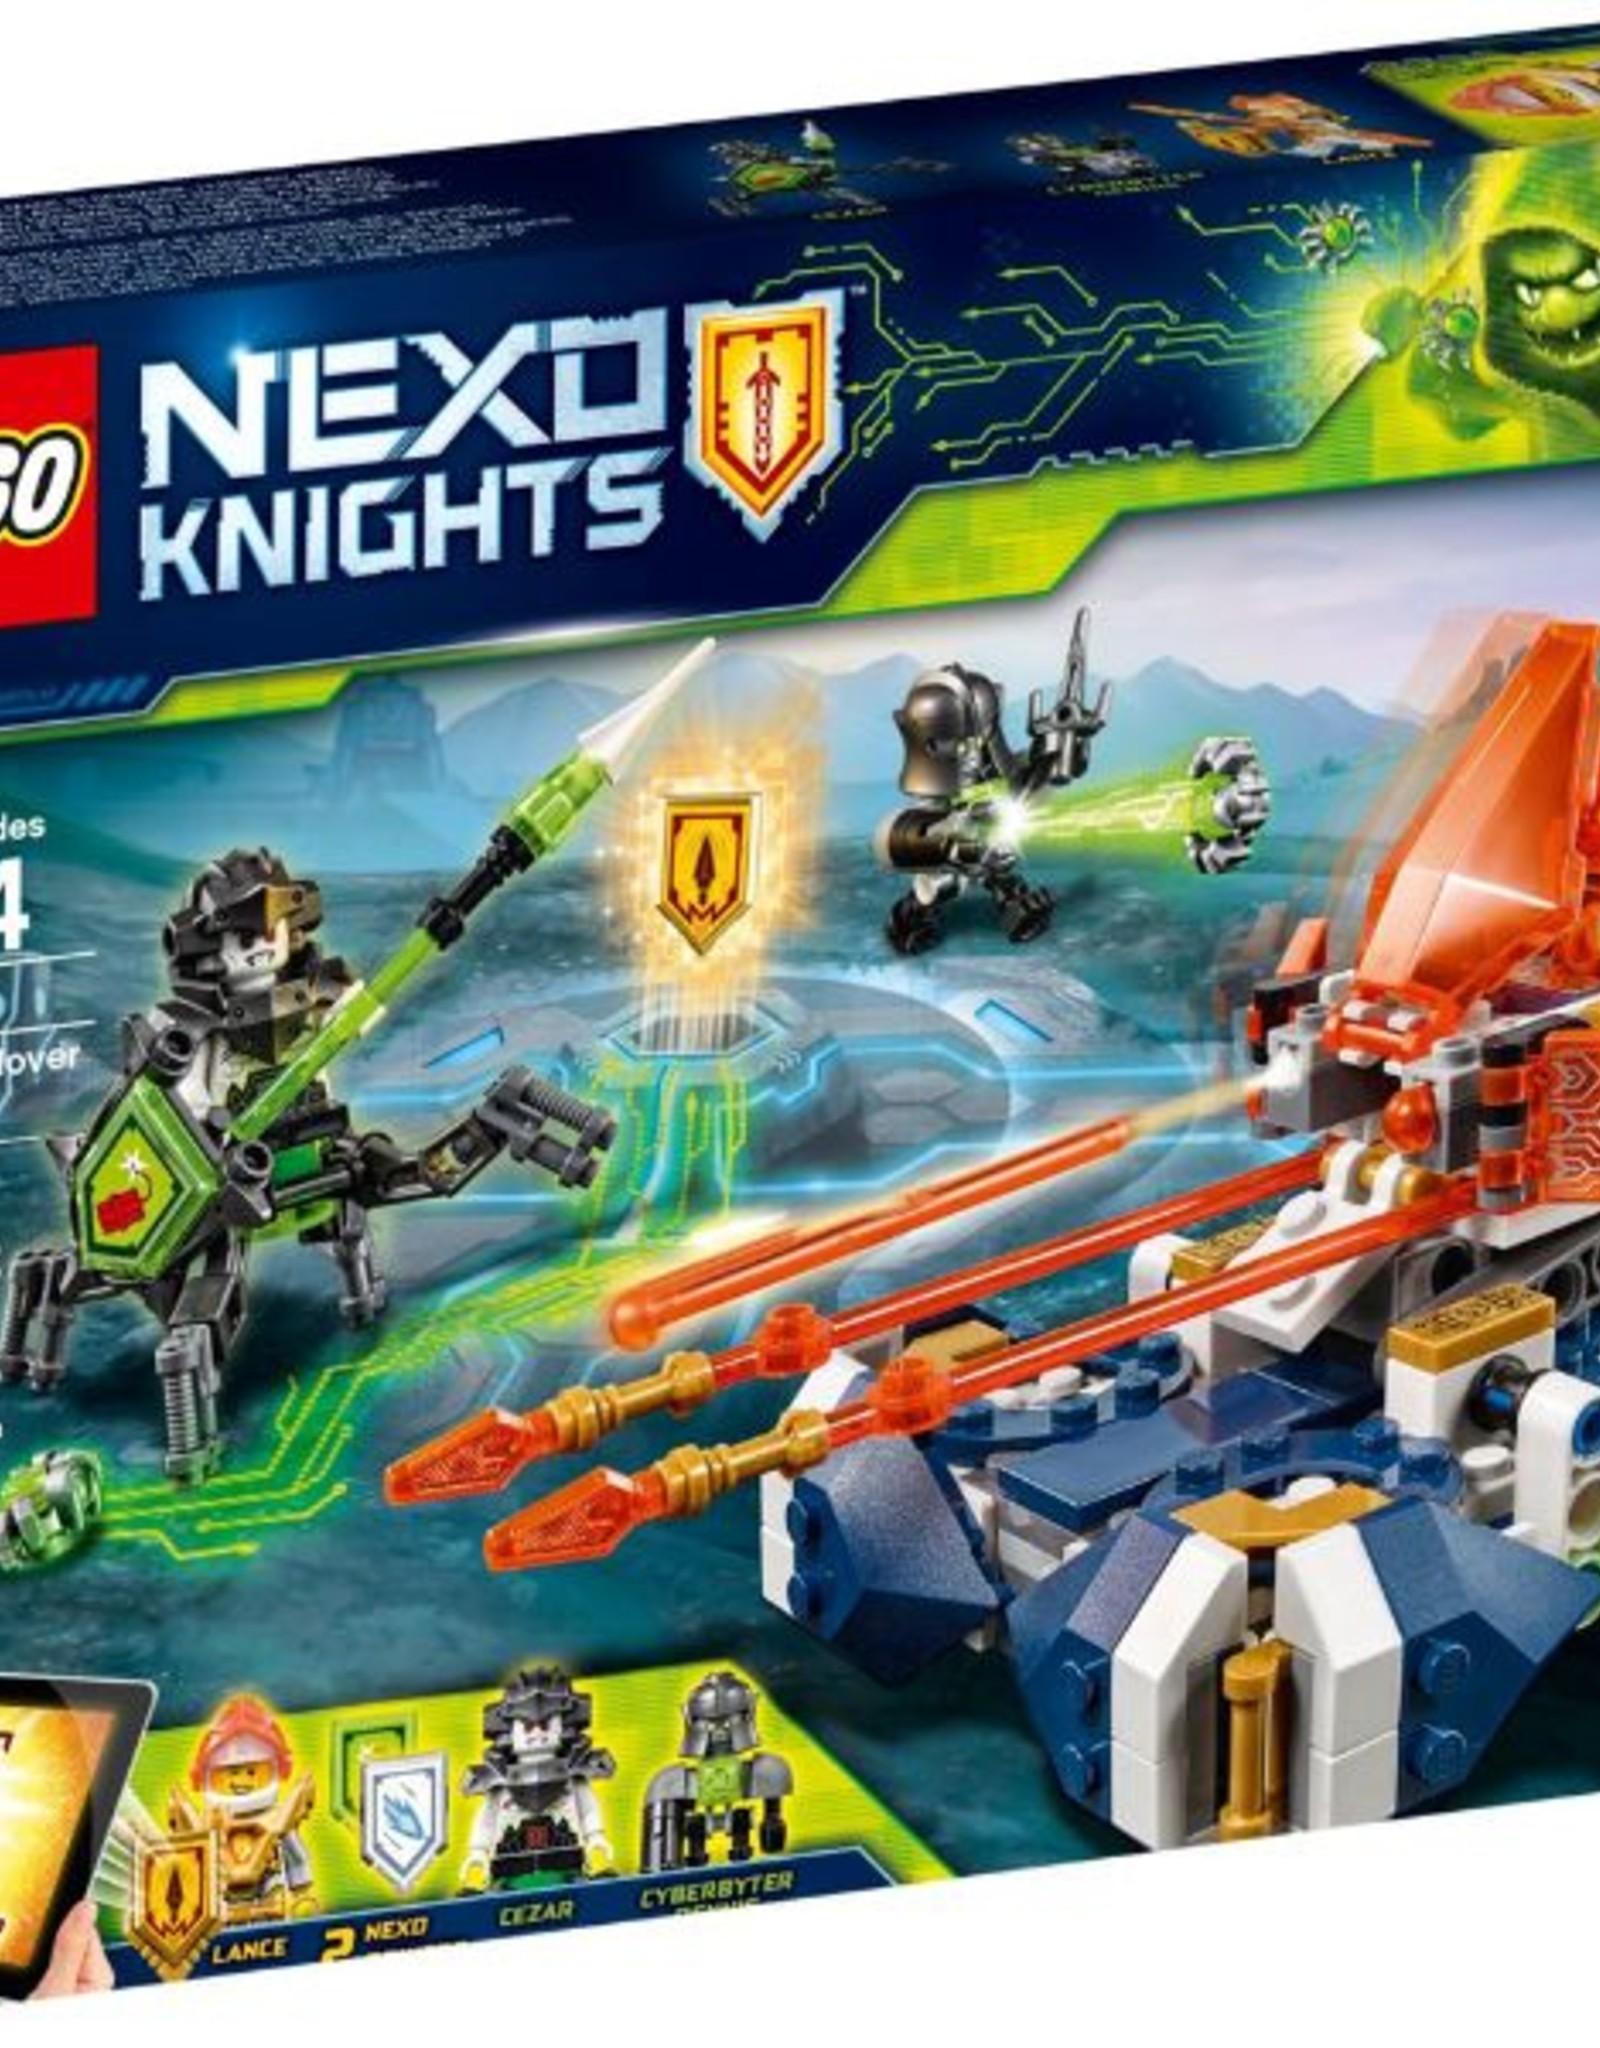 LEGO LEGO 72001 Lance's Hover Jouster NEXO KNIGHTS